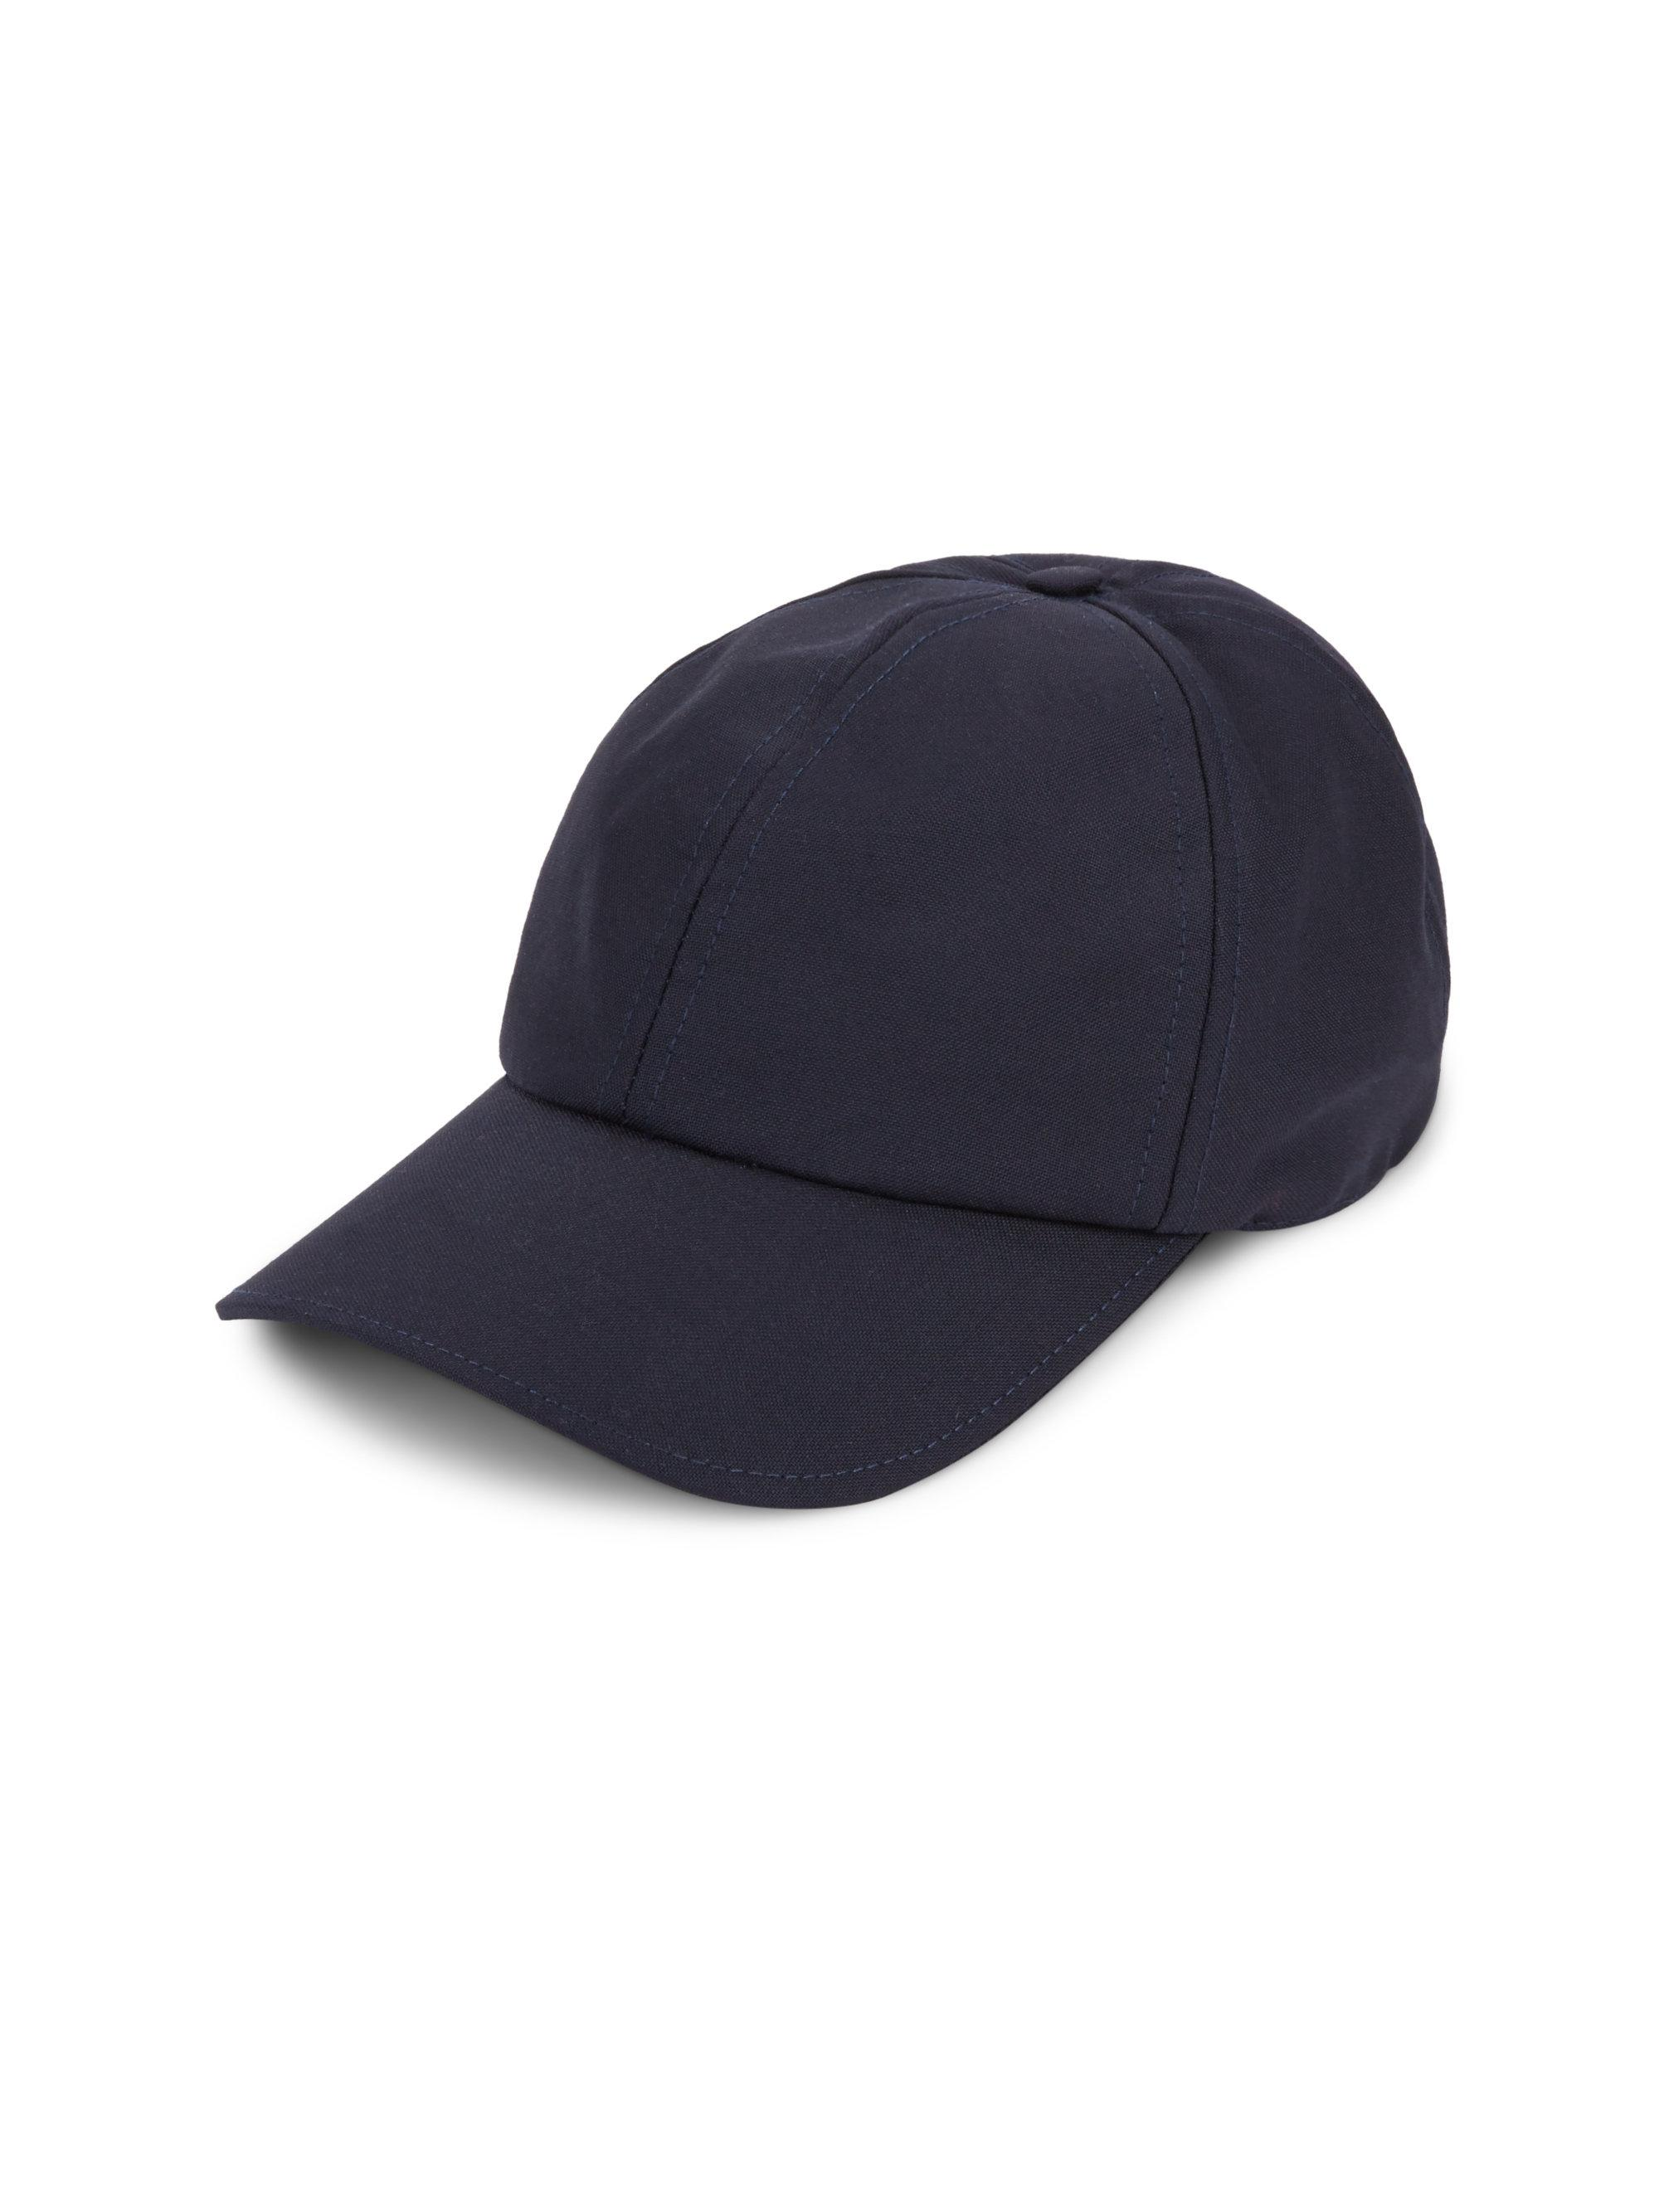 Wool-Blend Baseball Cap Officine Generale 8Q3le